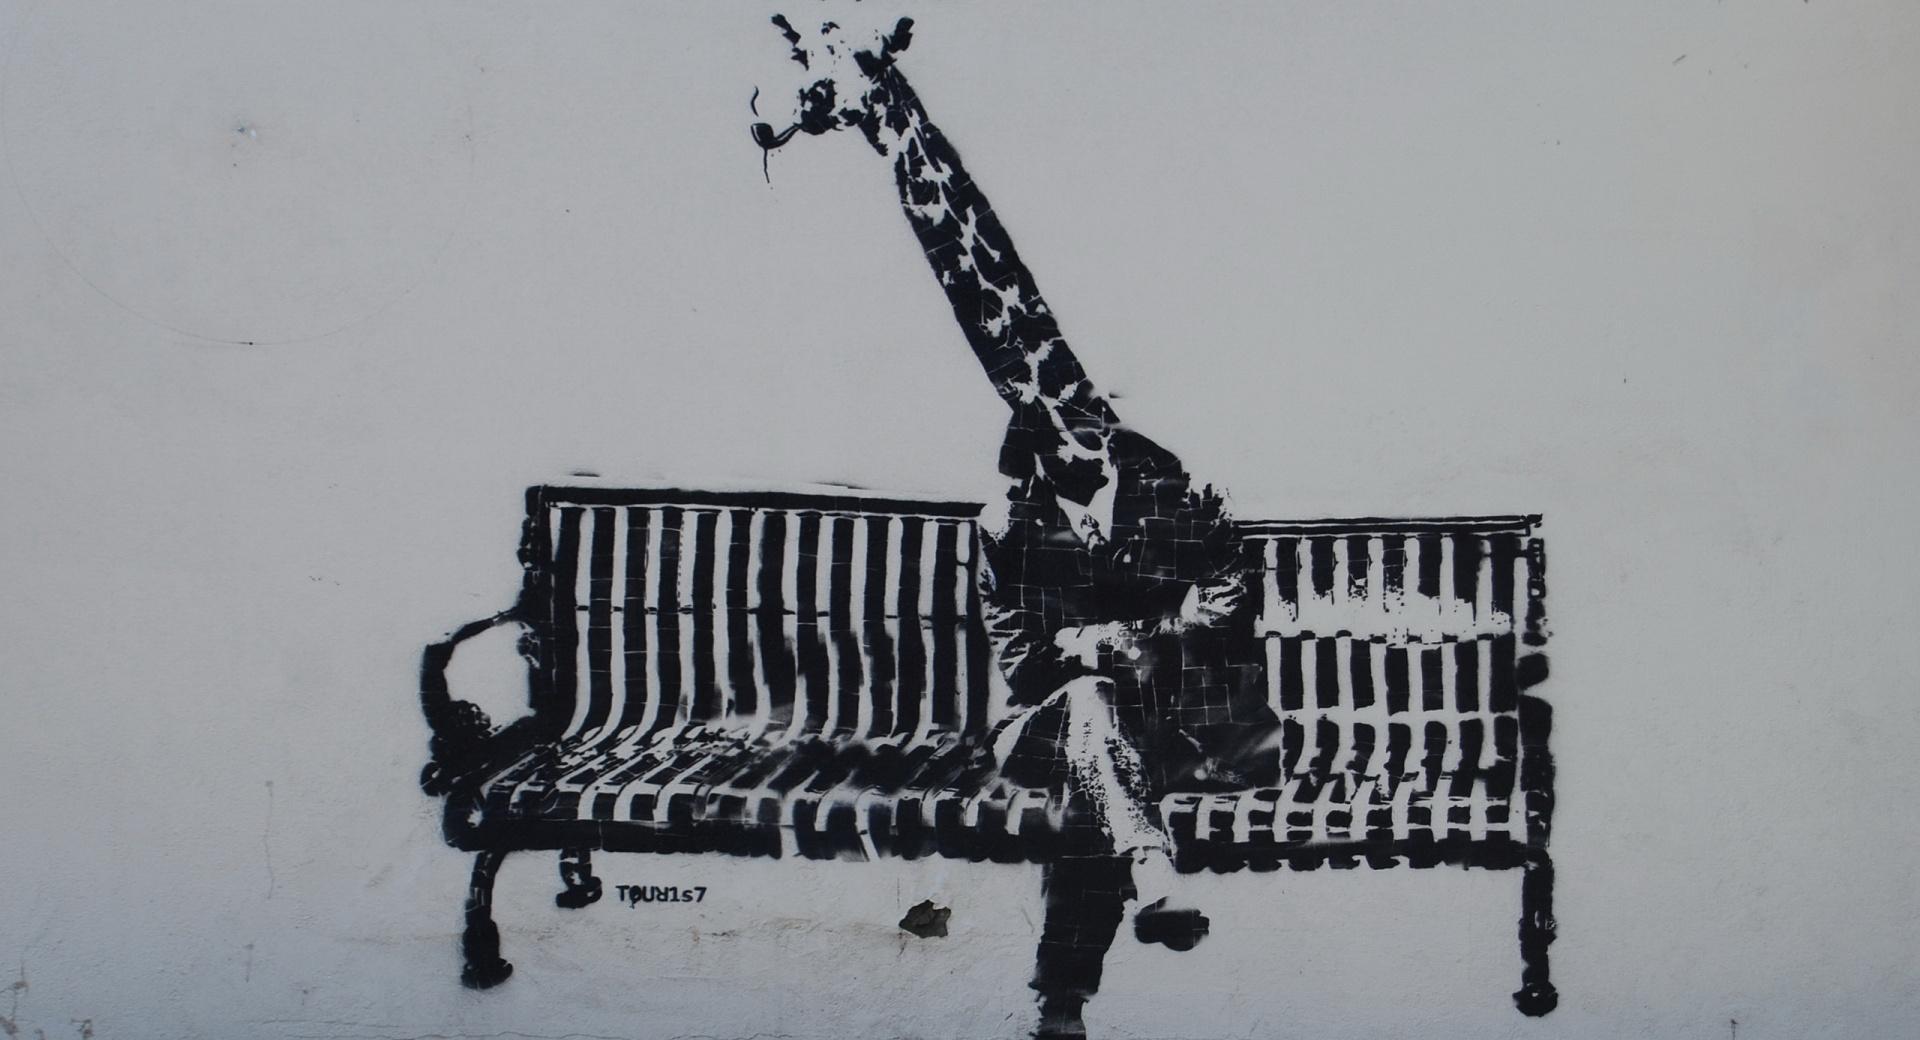 Giraffe Graffiti wallpapers HD quality